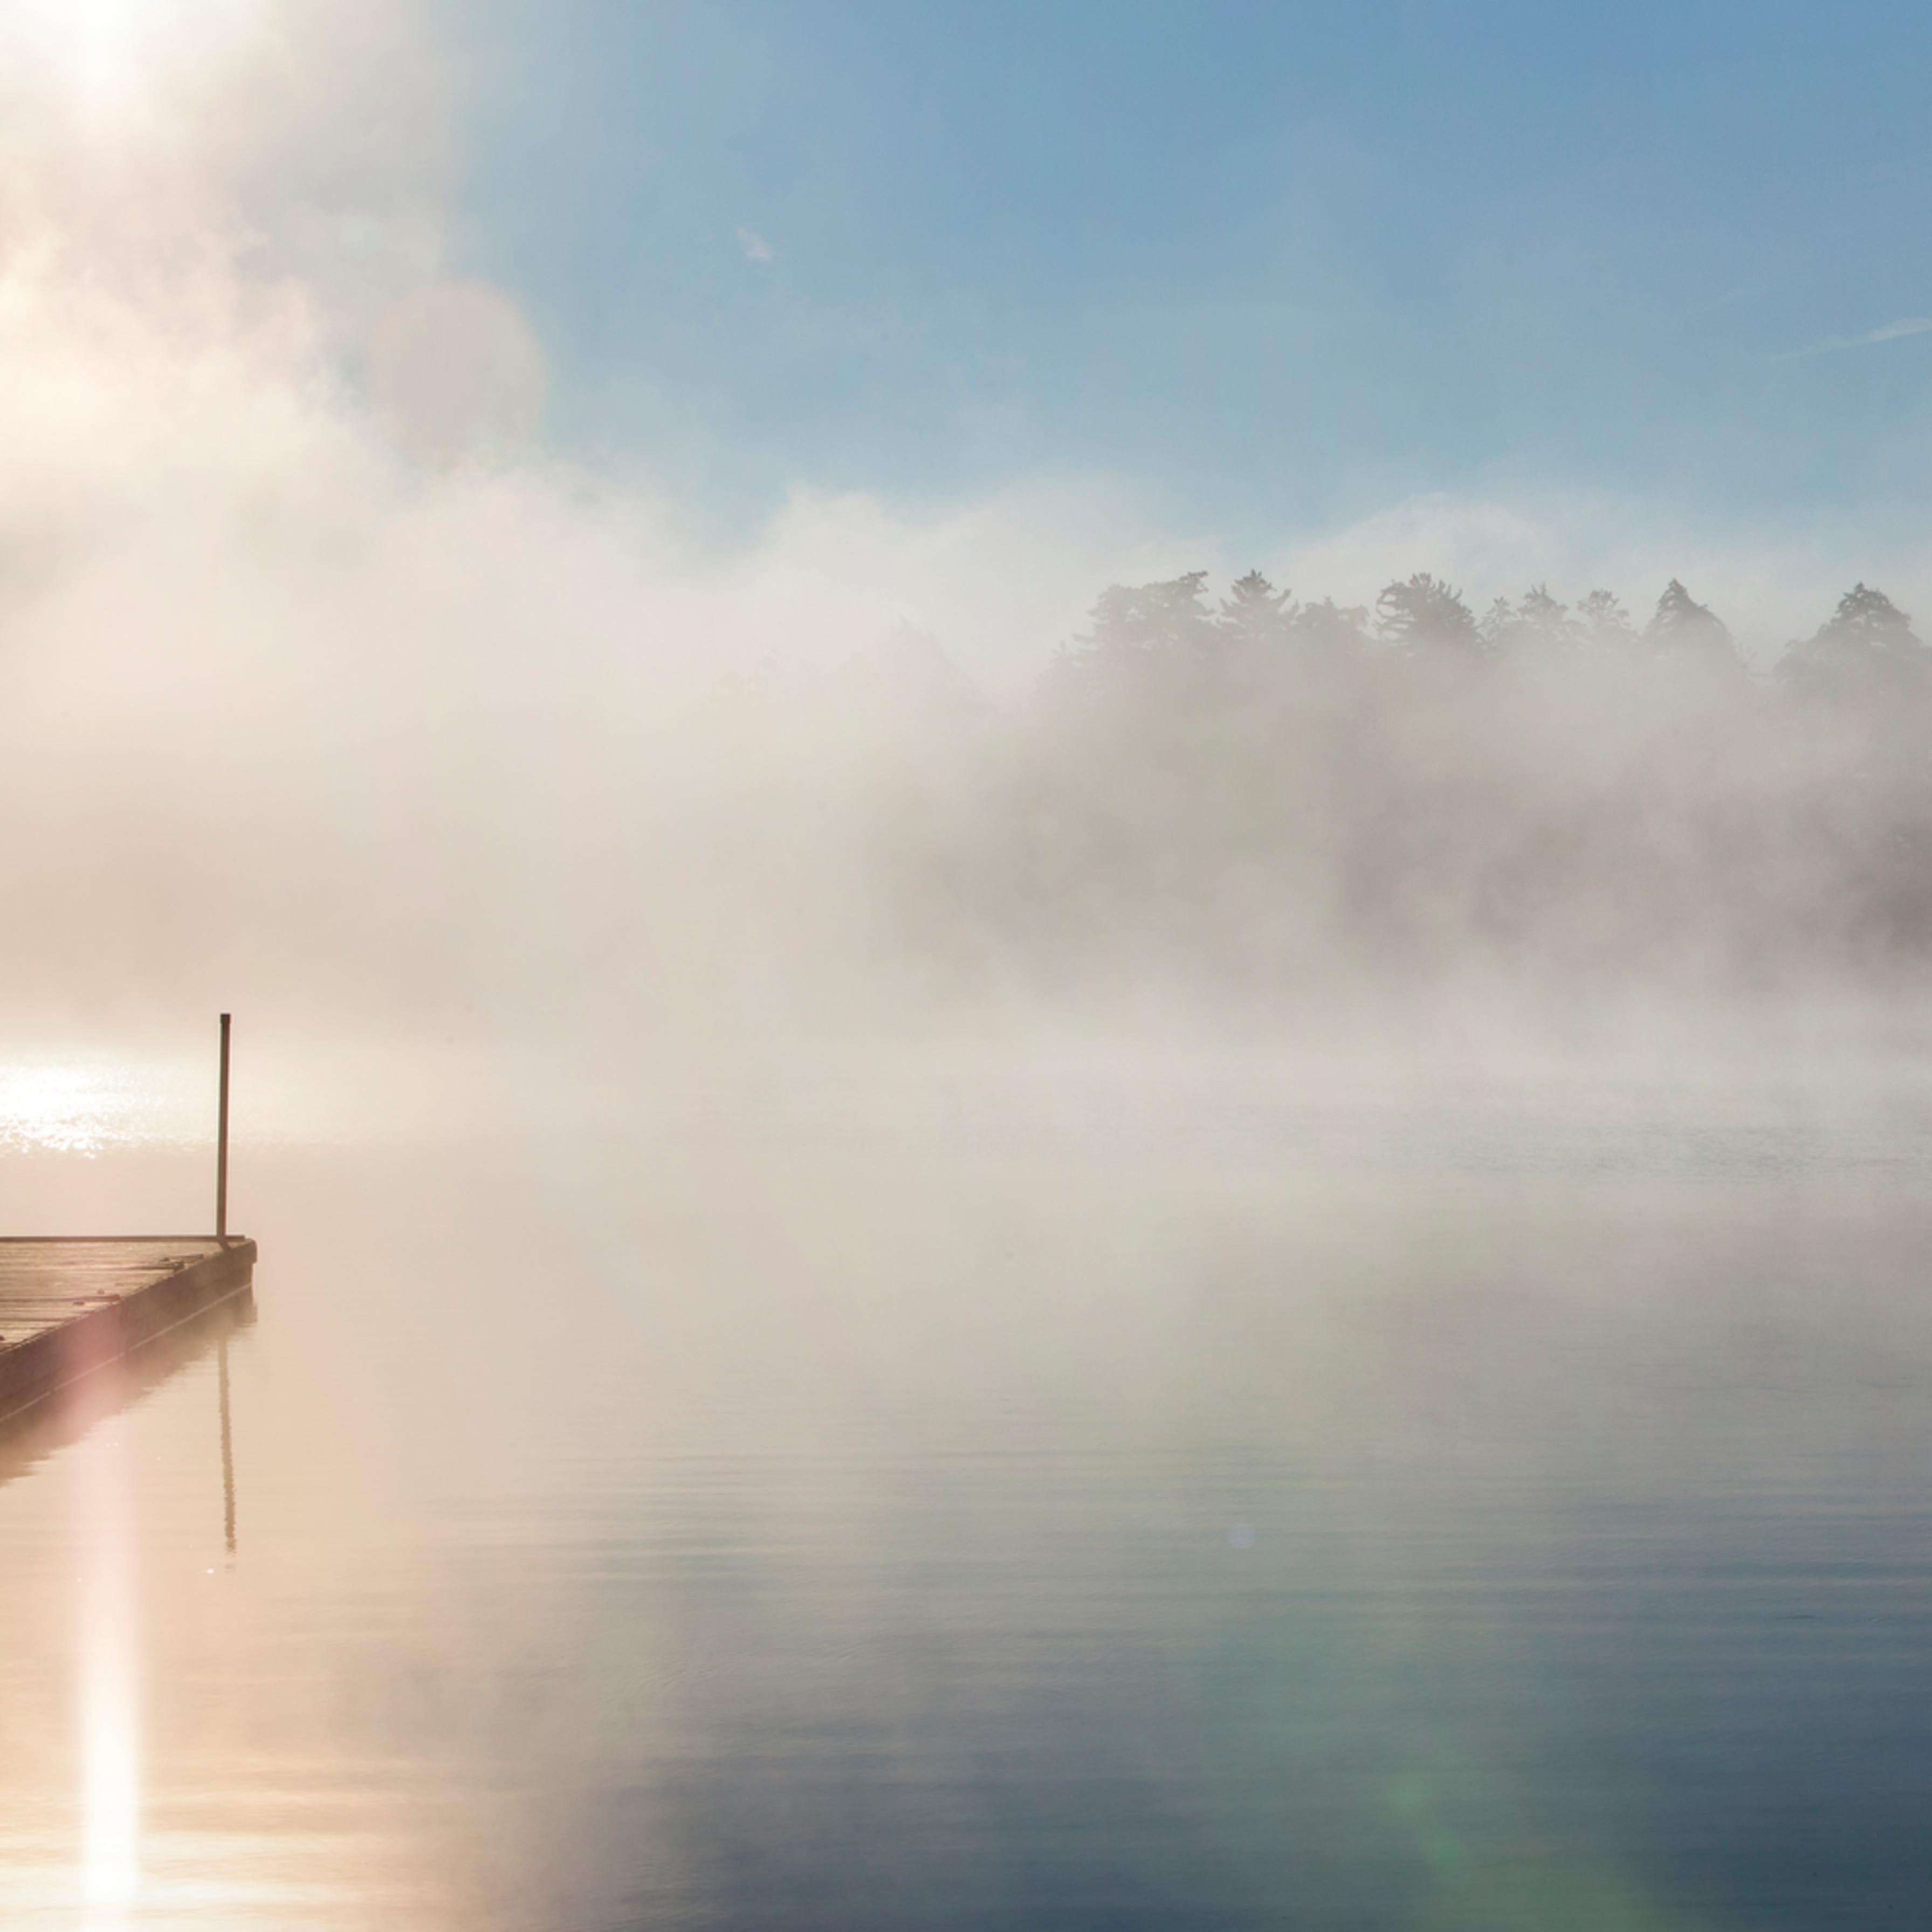 Raquette lake dock pano olxnxr